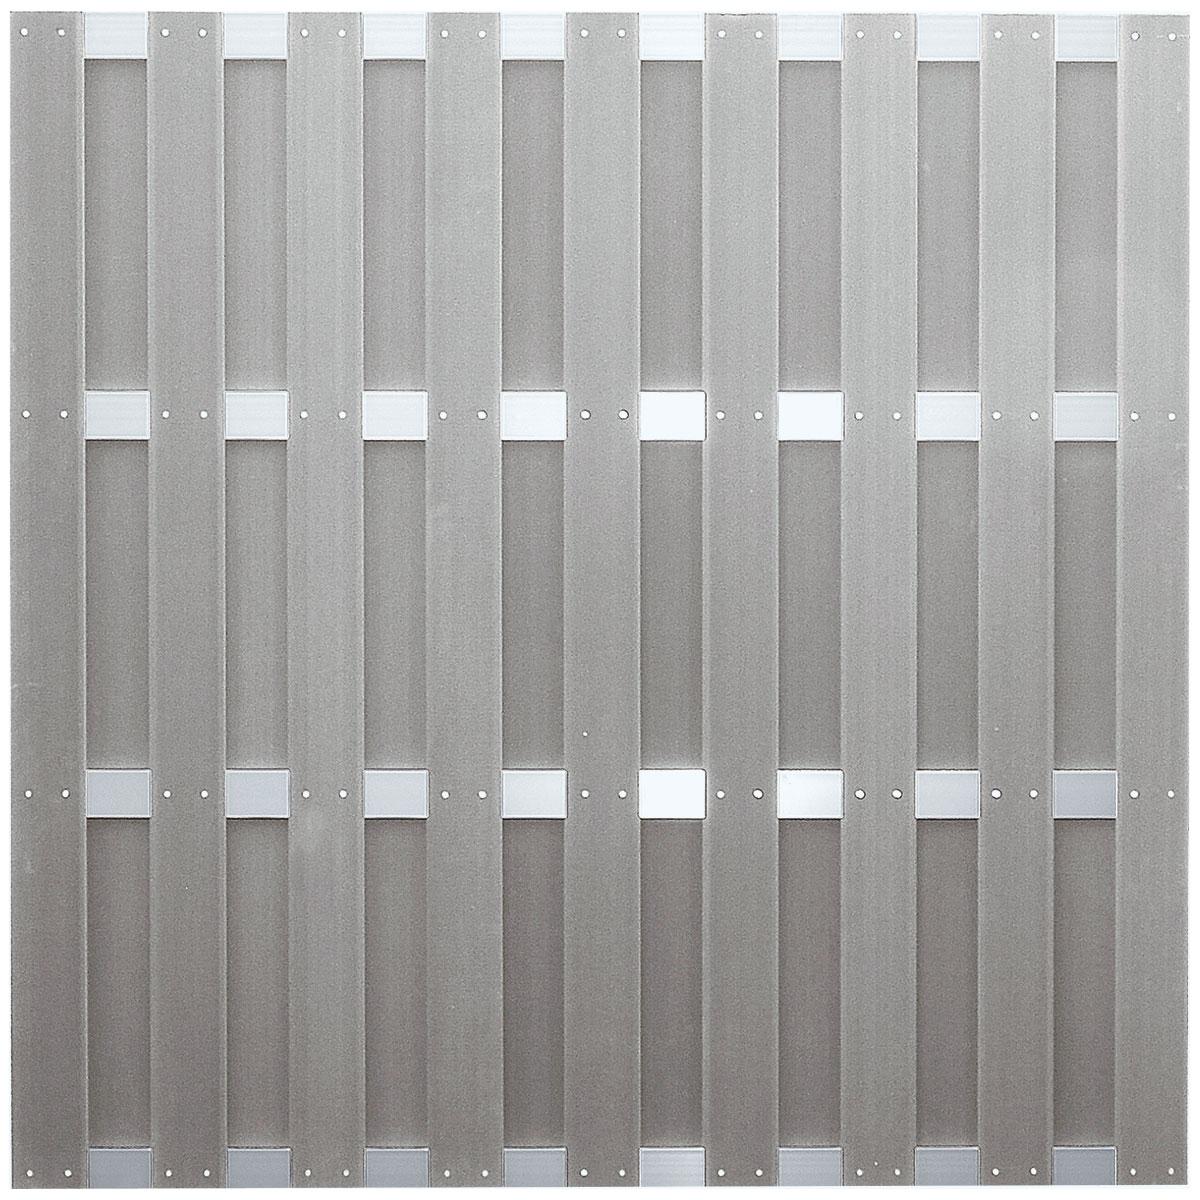 "Ideenwelt T&J Zaunserie ""JINAN"", grau, 180 x 180 cm, WPC-Bretterzaun"